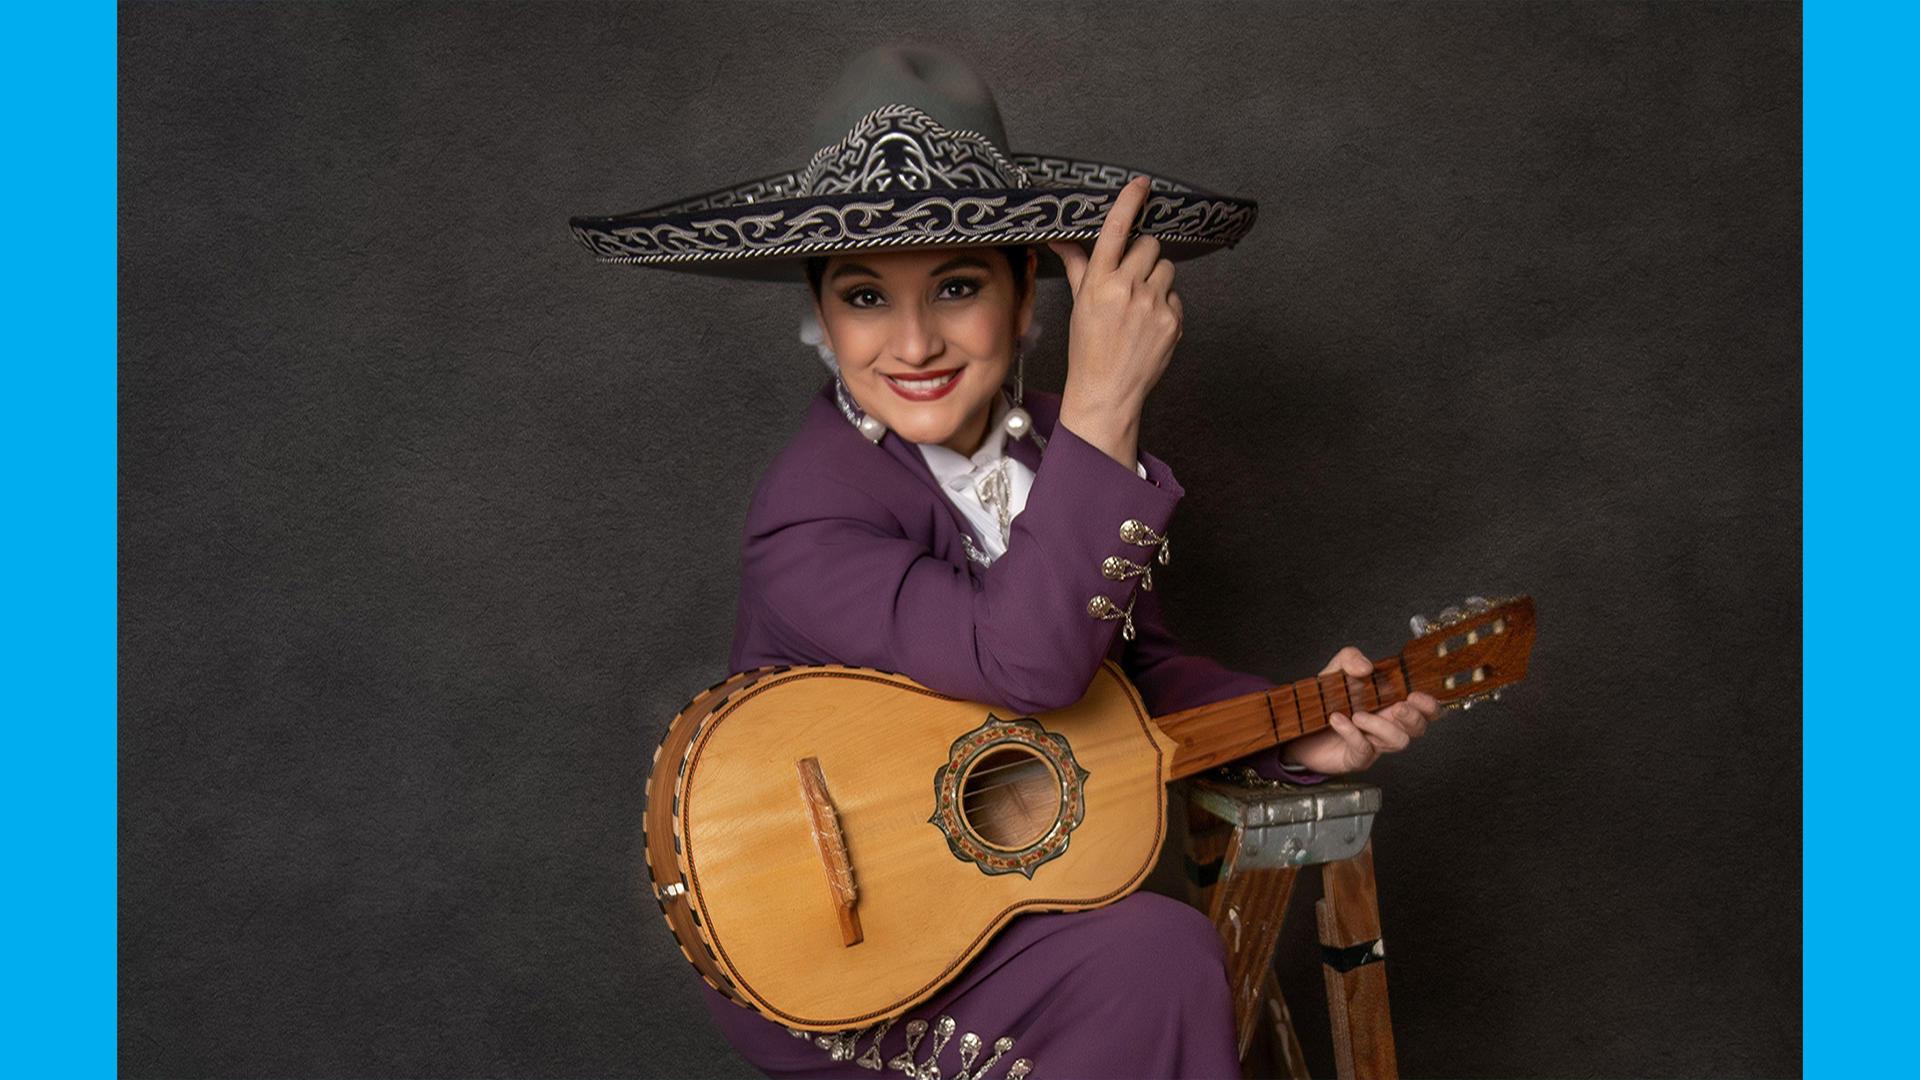 Veronica Robles, photo by Sara de Alba